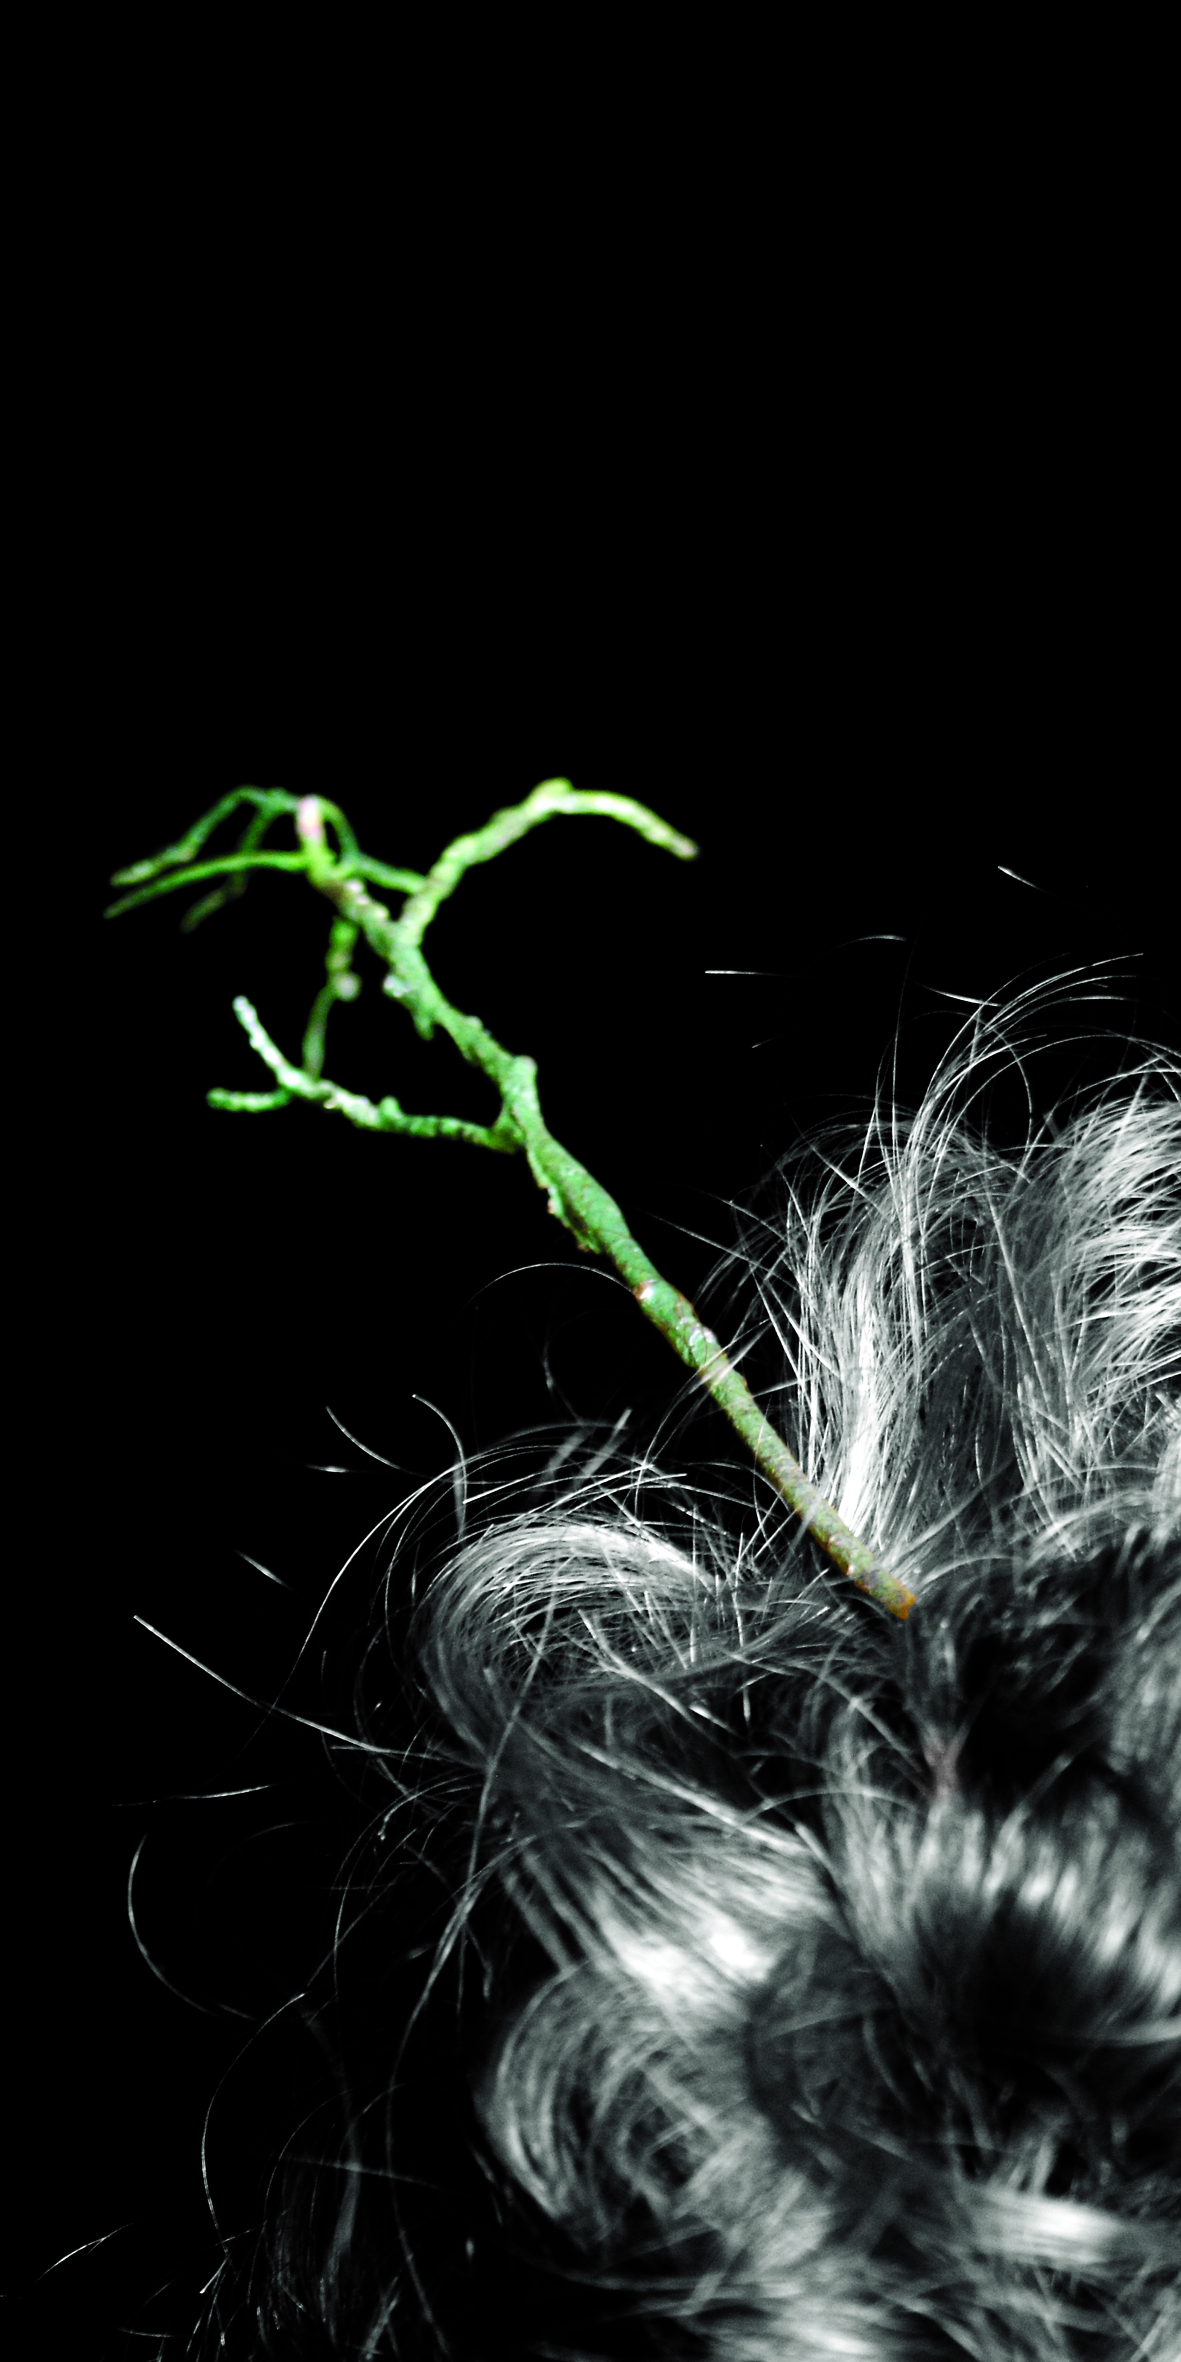 hair branch.jpg